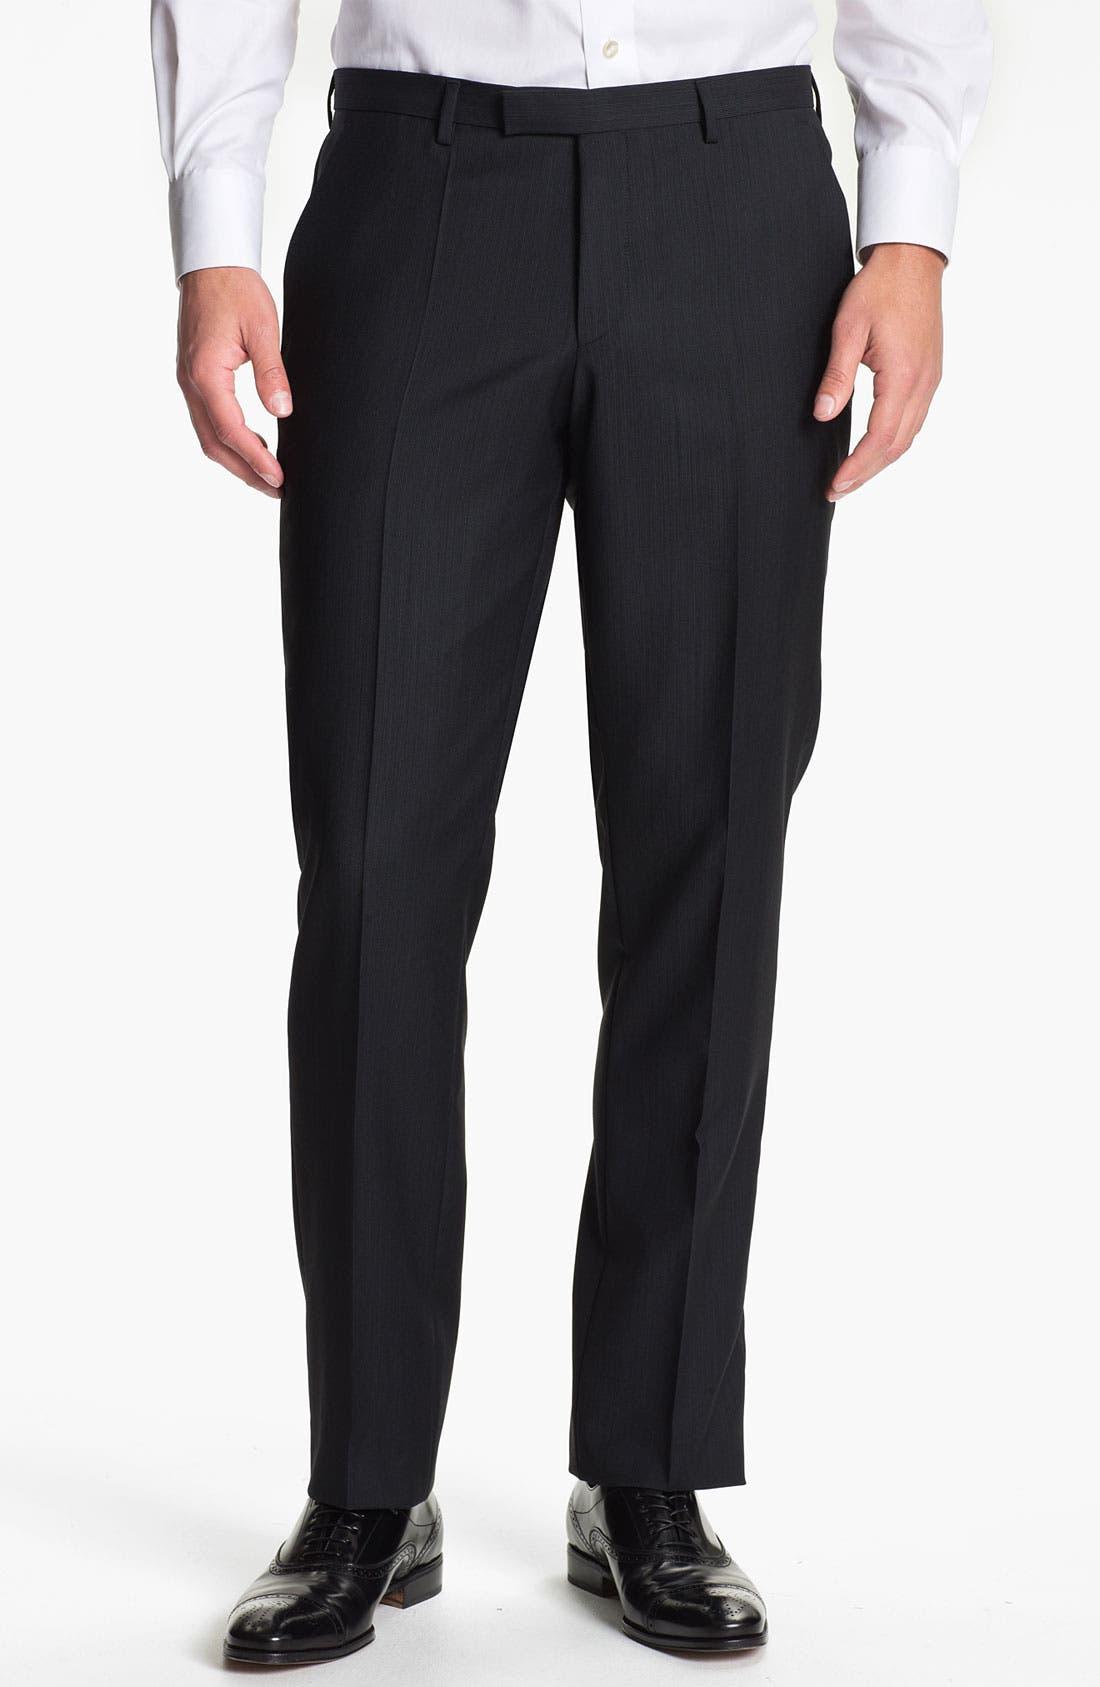 Alternate Image 1 Selected - BOSS Black 'Sharp' Flat Front Trousers